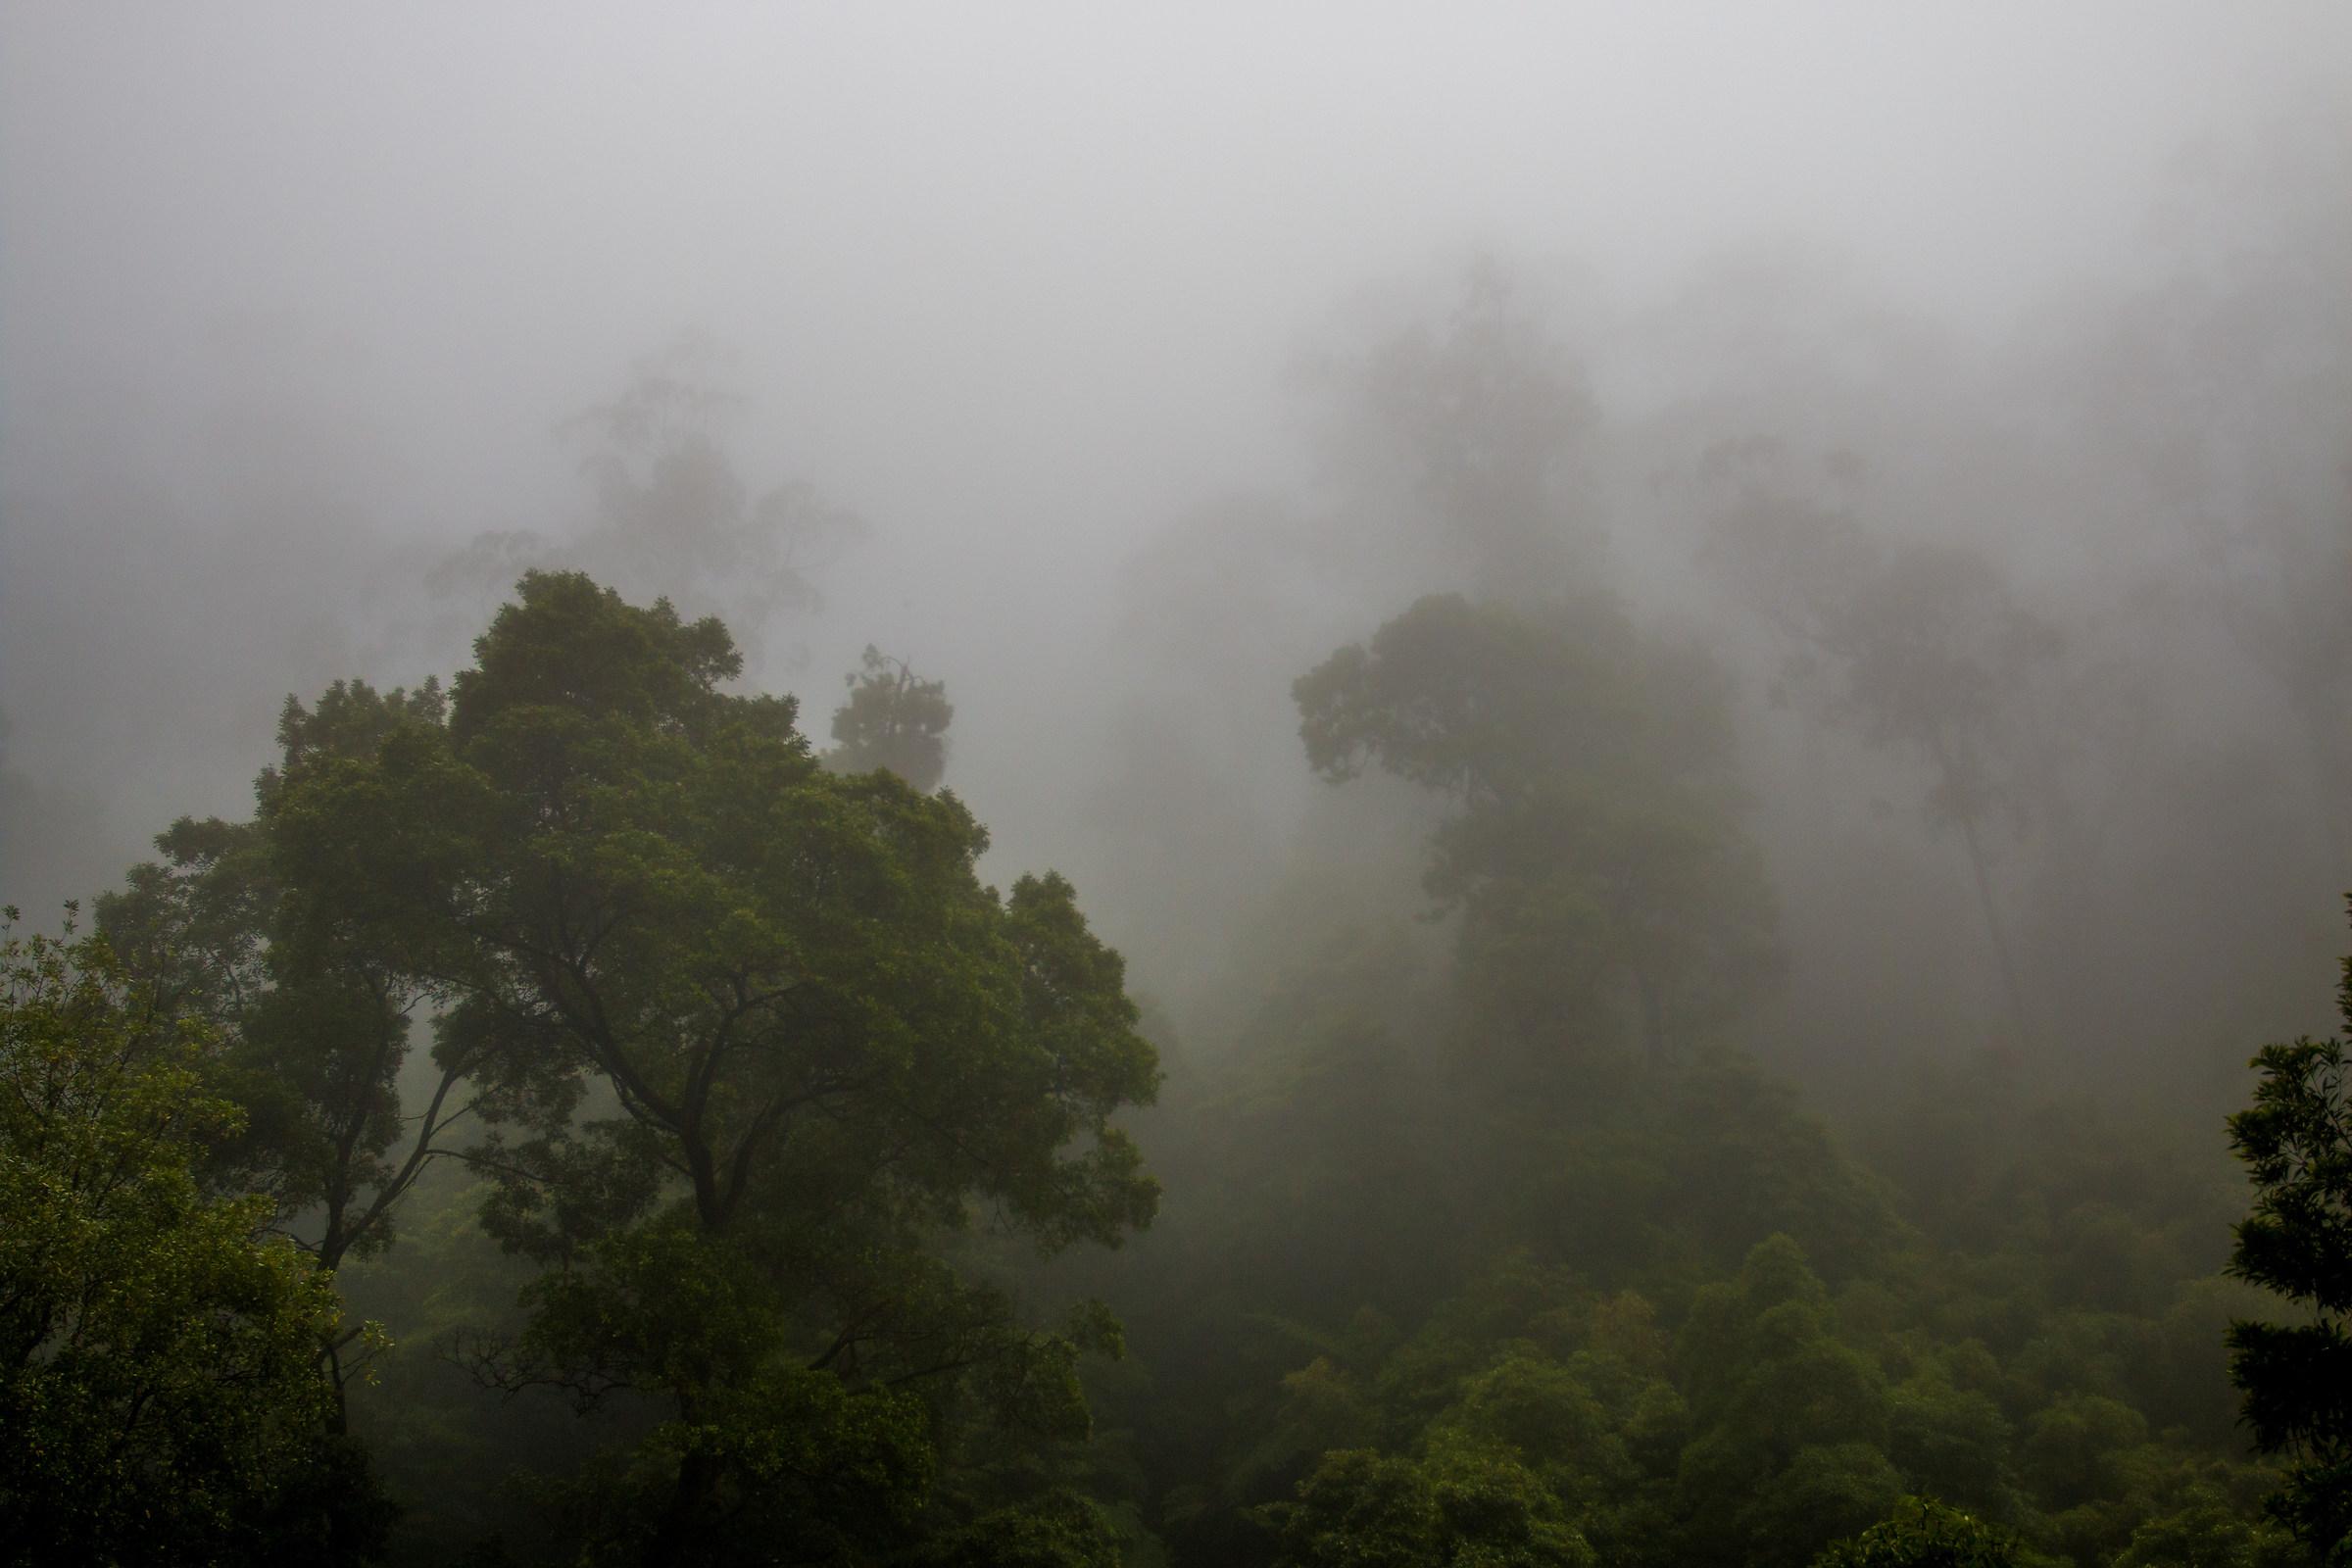 Giants in the fog...